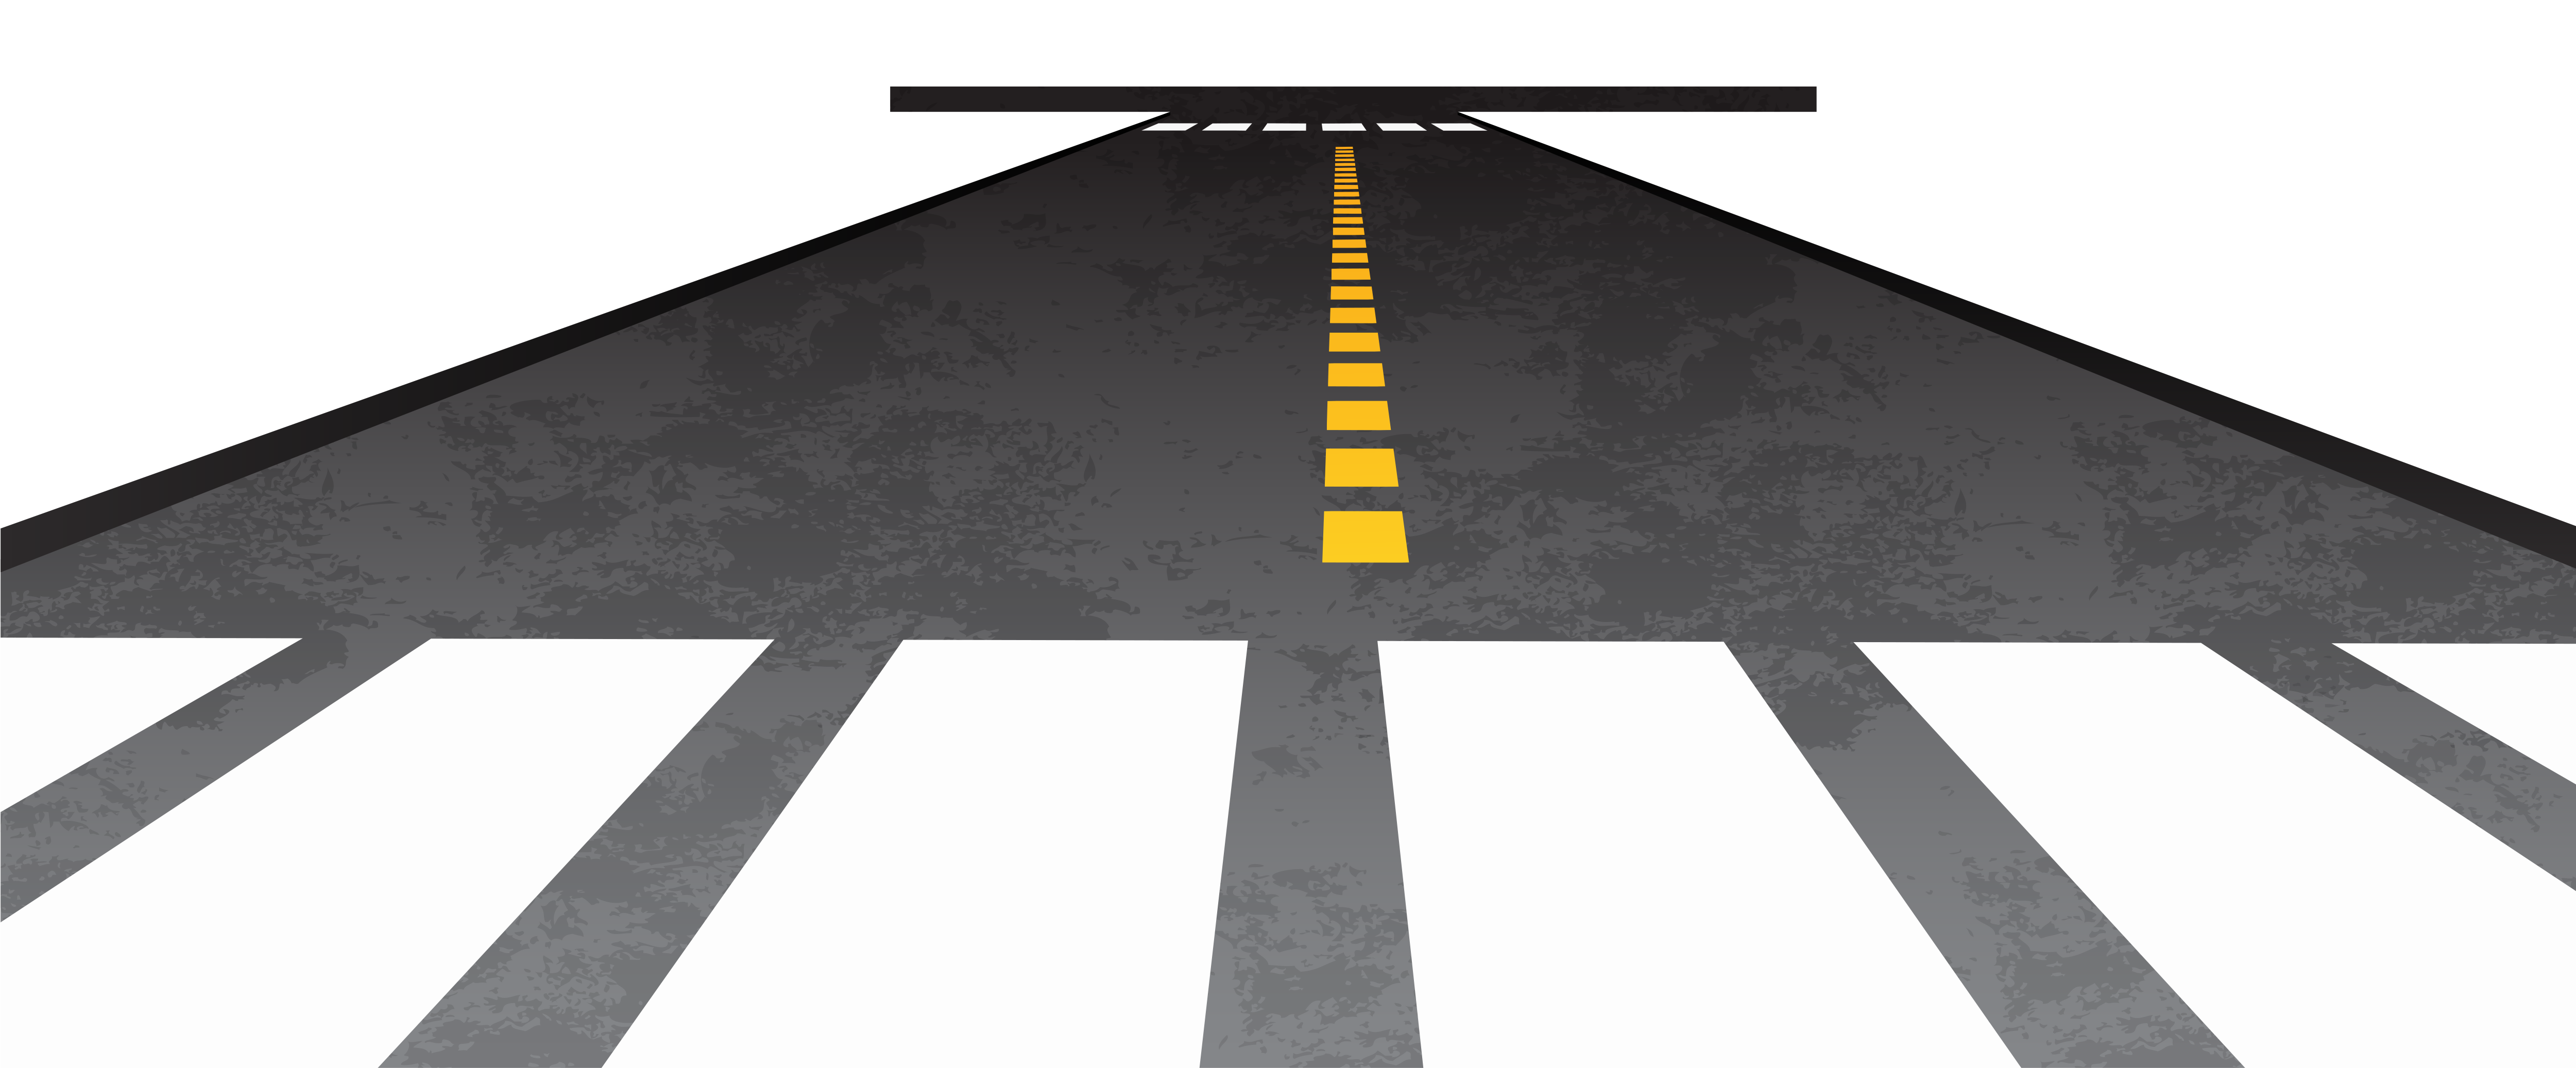 5001x2074 Straight Road Clip Art Clipart